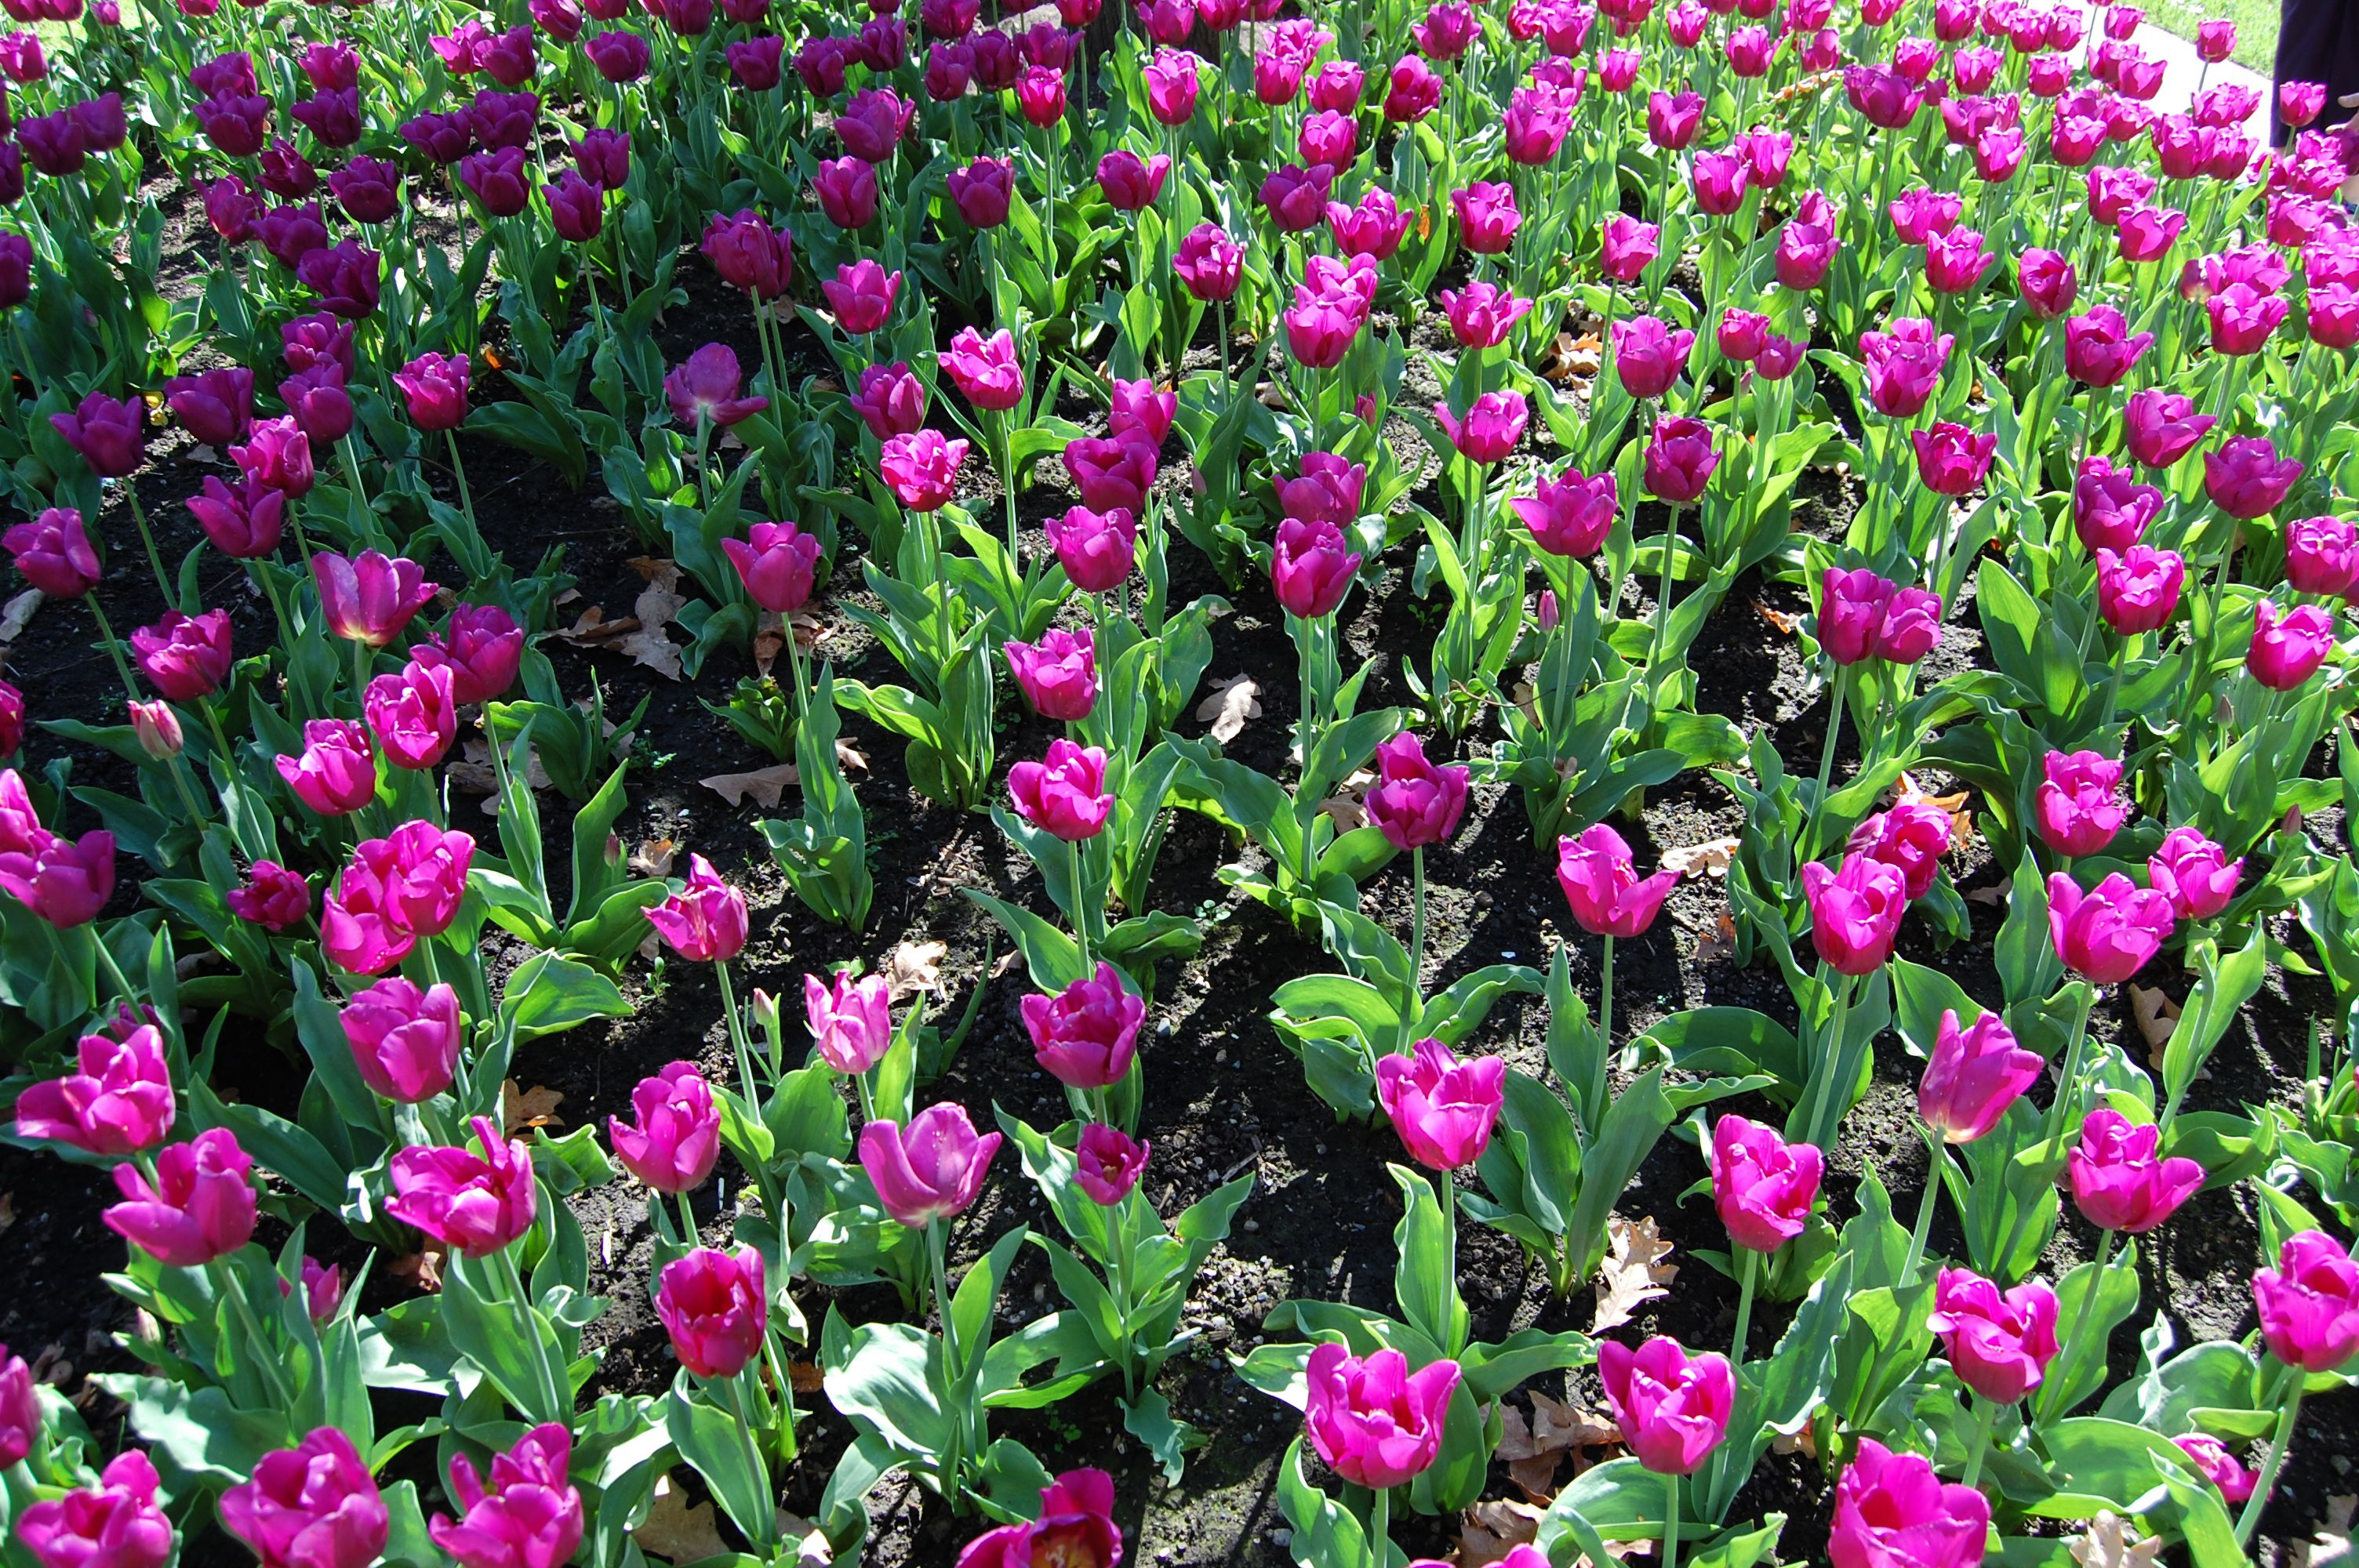 Tulips at Bush's Pasture Park